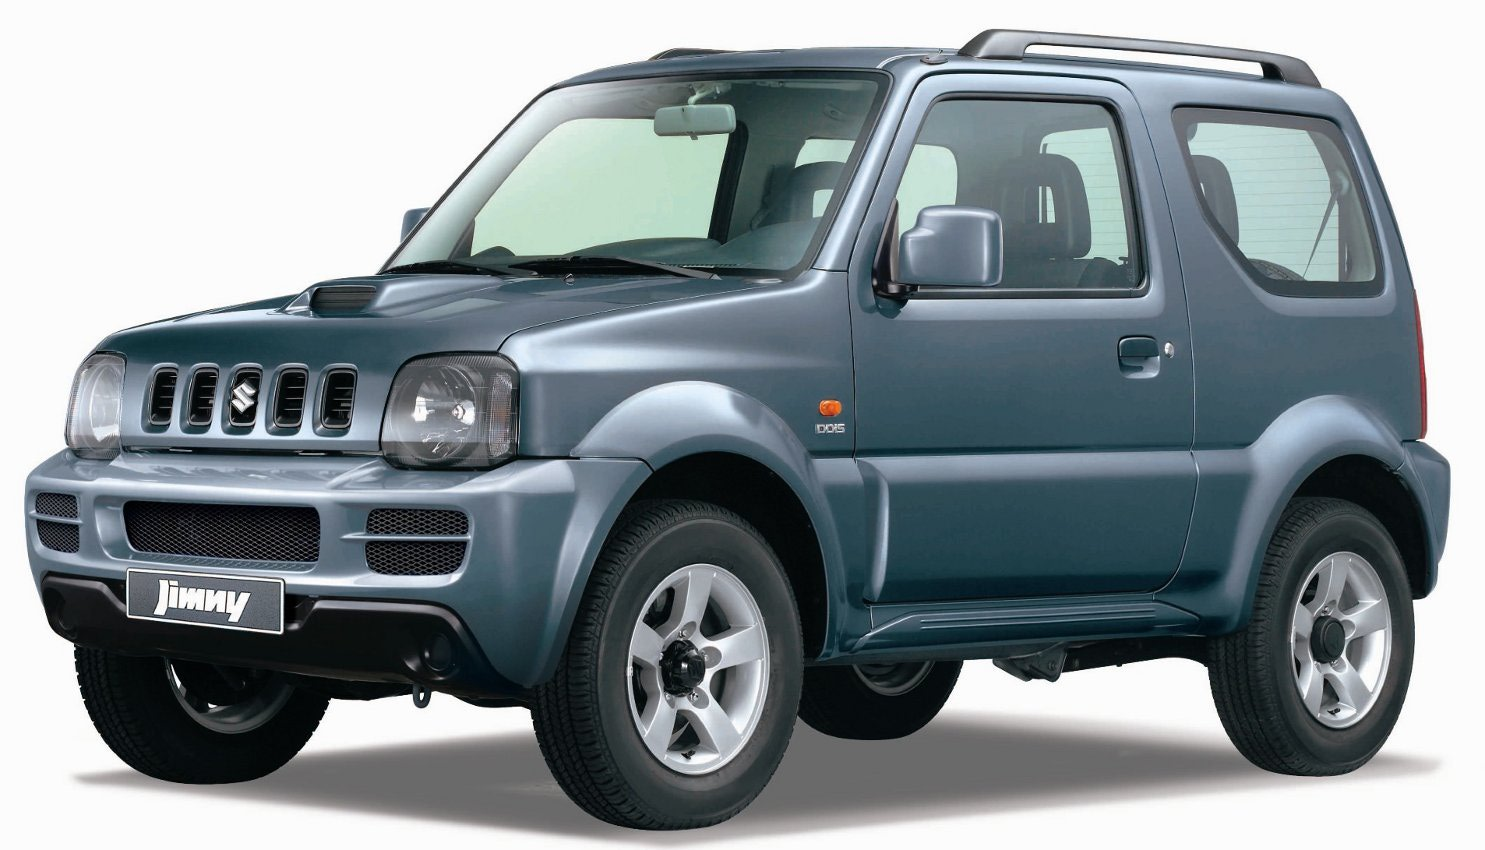 ¿Suzuki Jimny Diesel o gasolina?